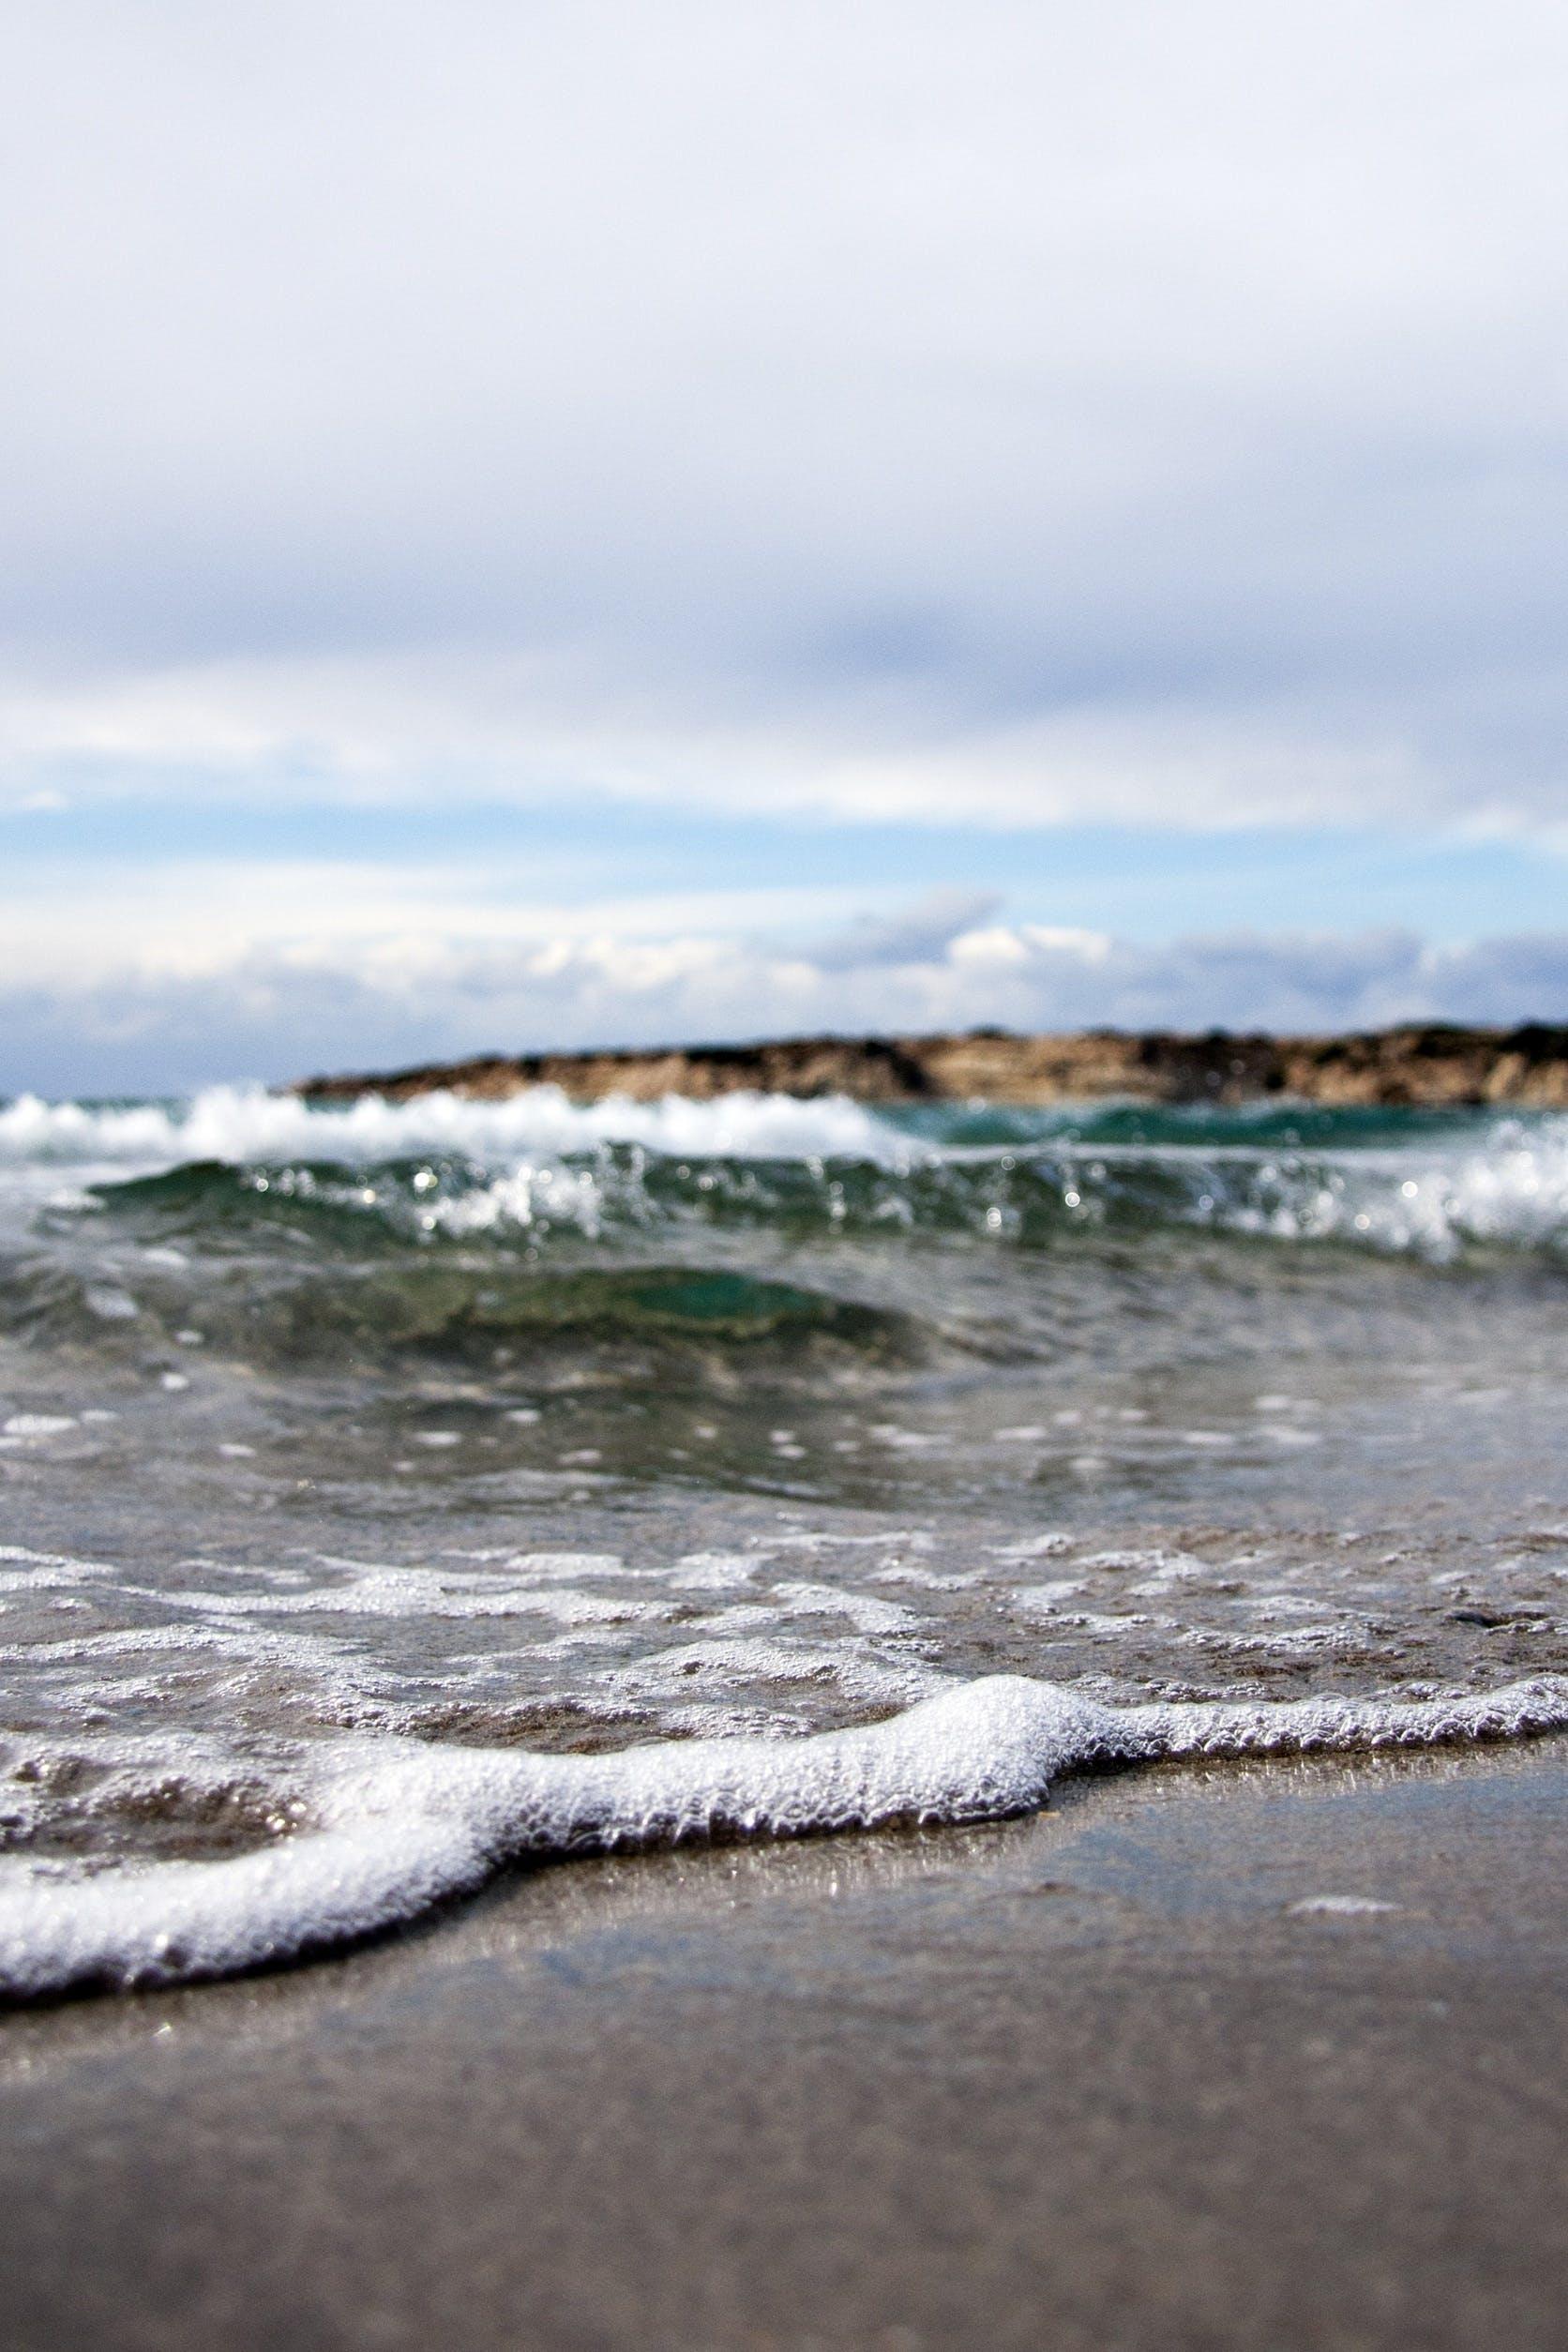 Free stock photo of sea, beach, sand, water